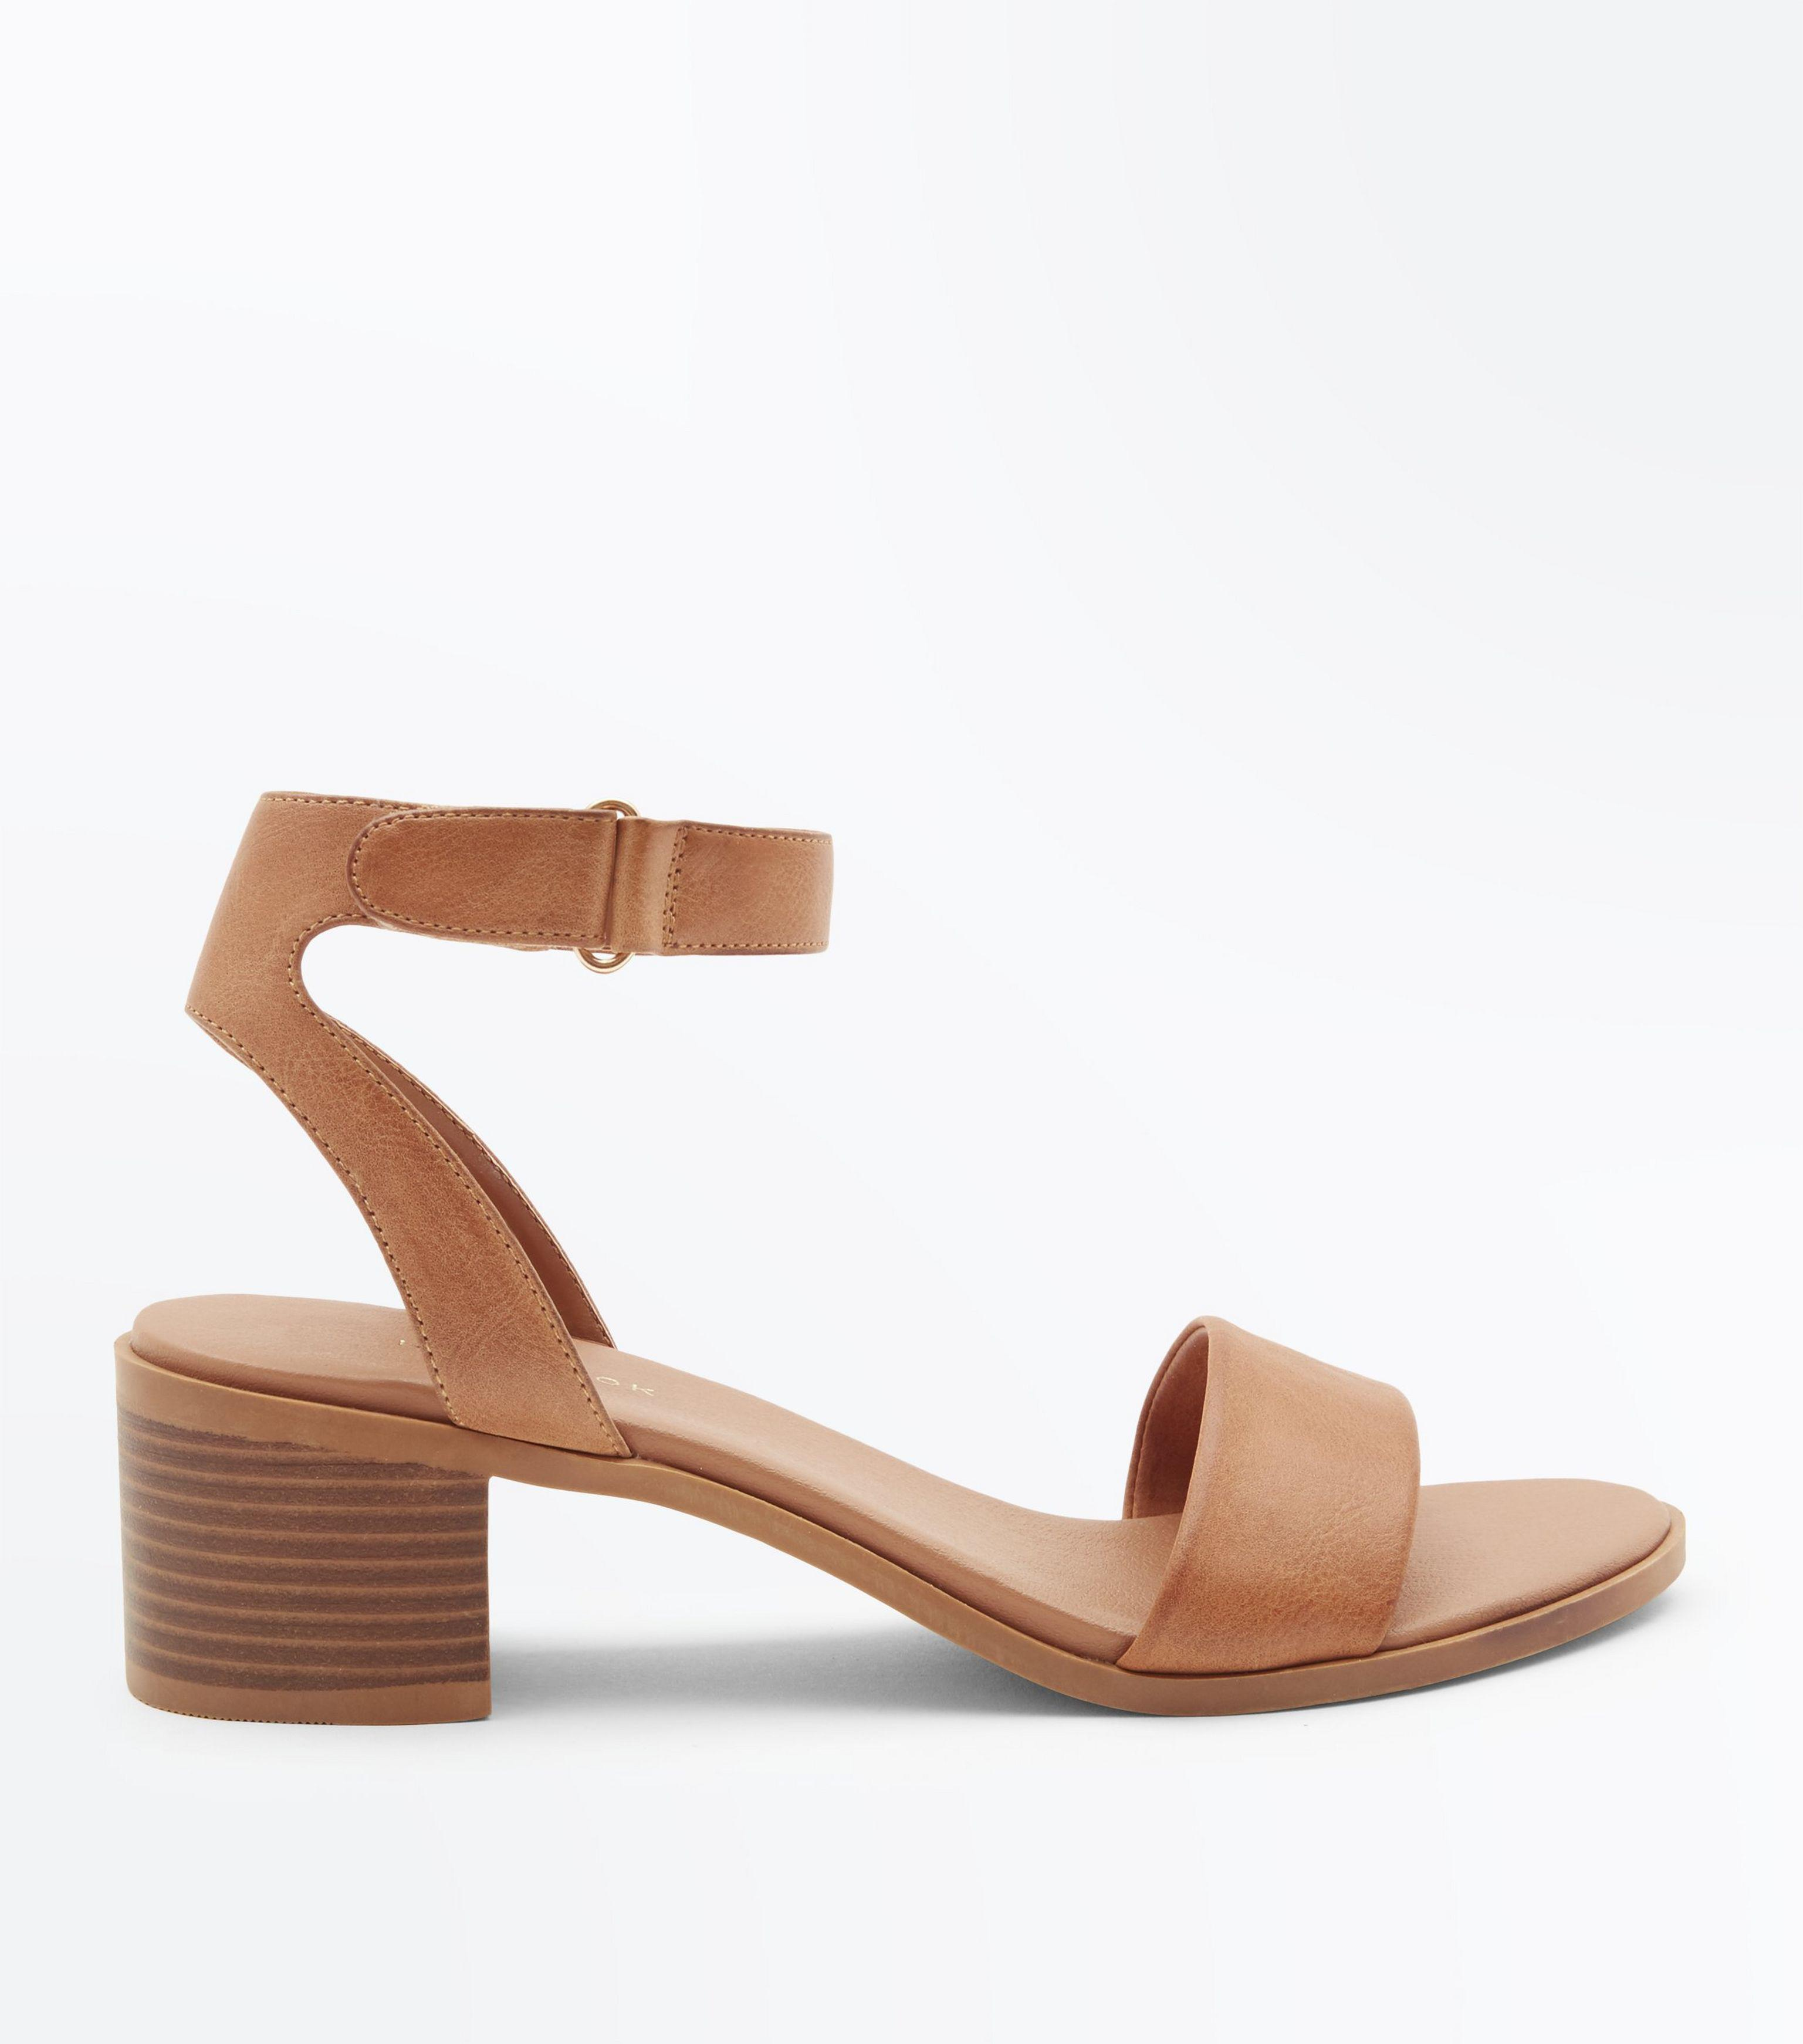 2a6bf7f2c157 New Look Tan Low Block Heel Flexible Sole Sandals In Brown Lyst